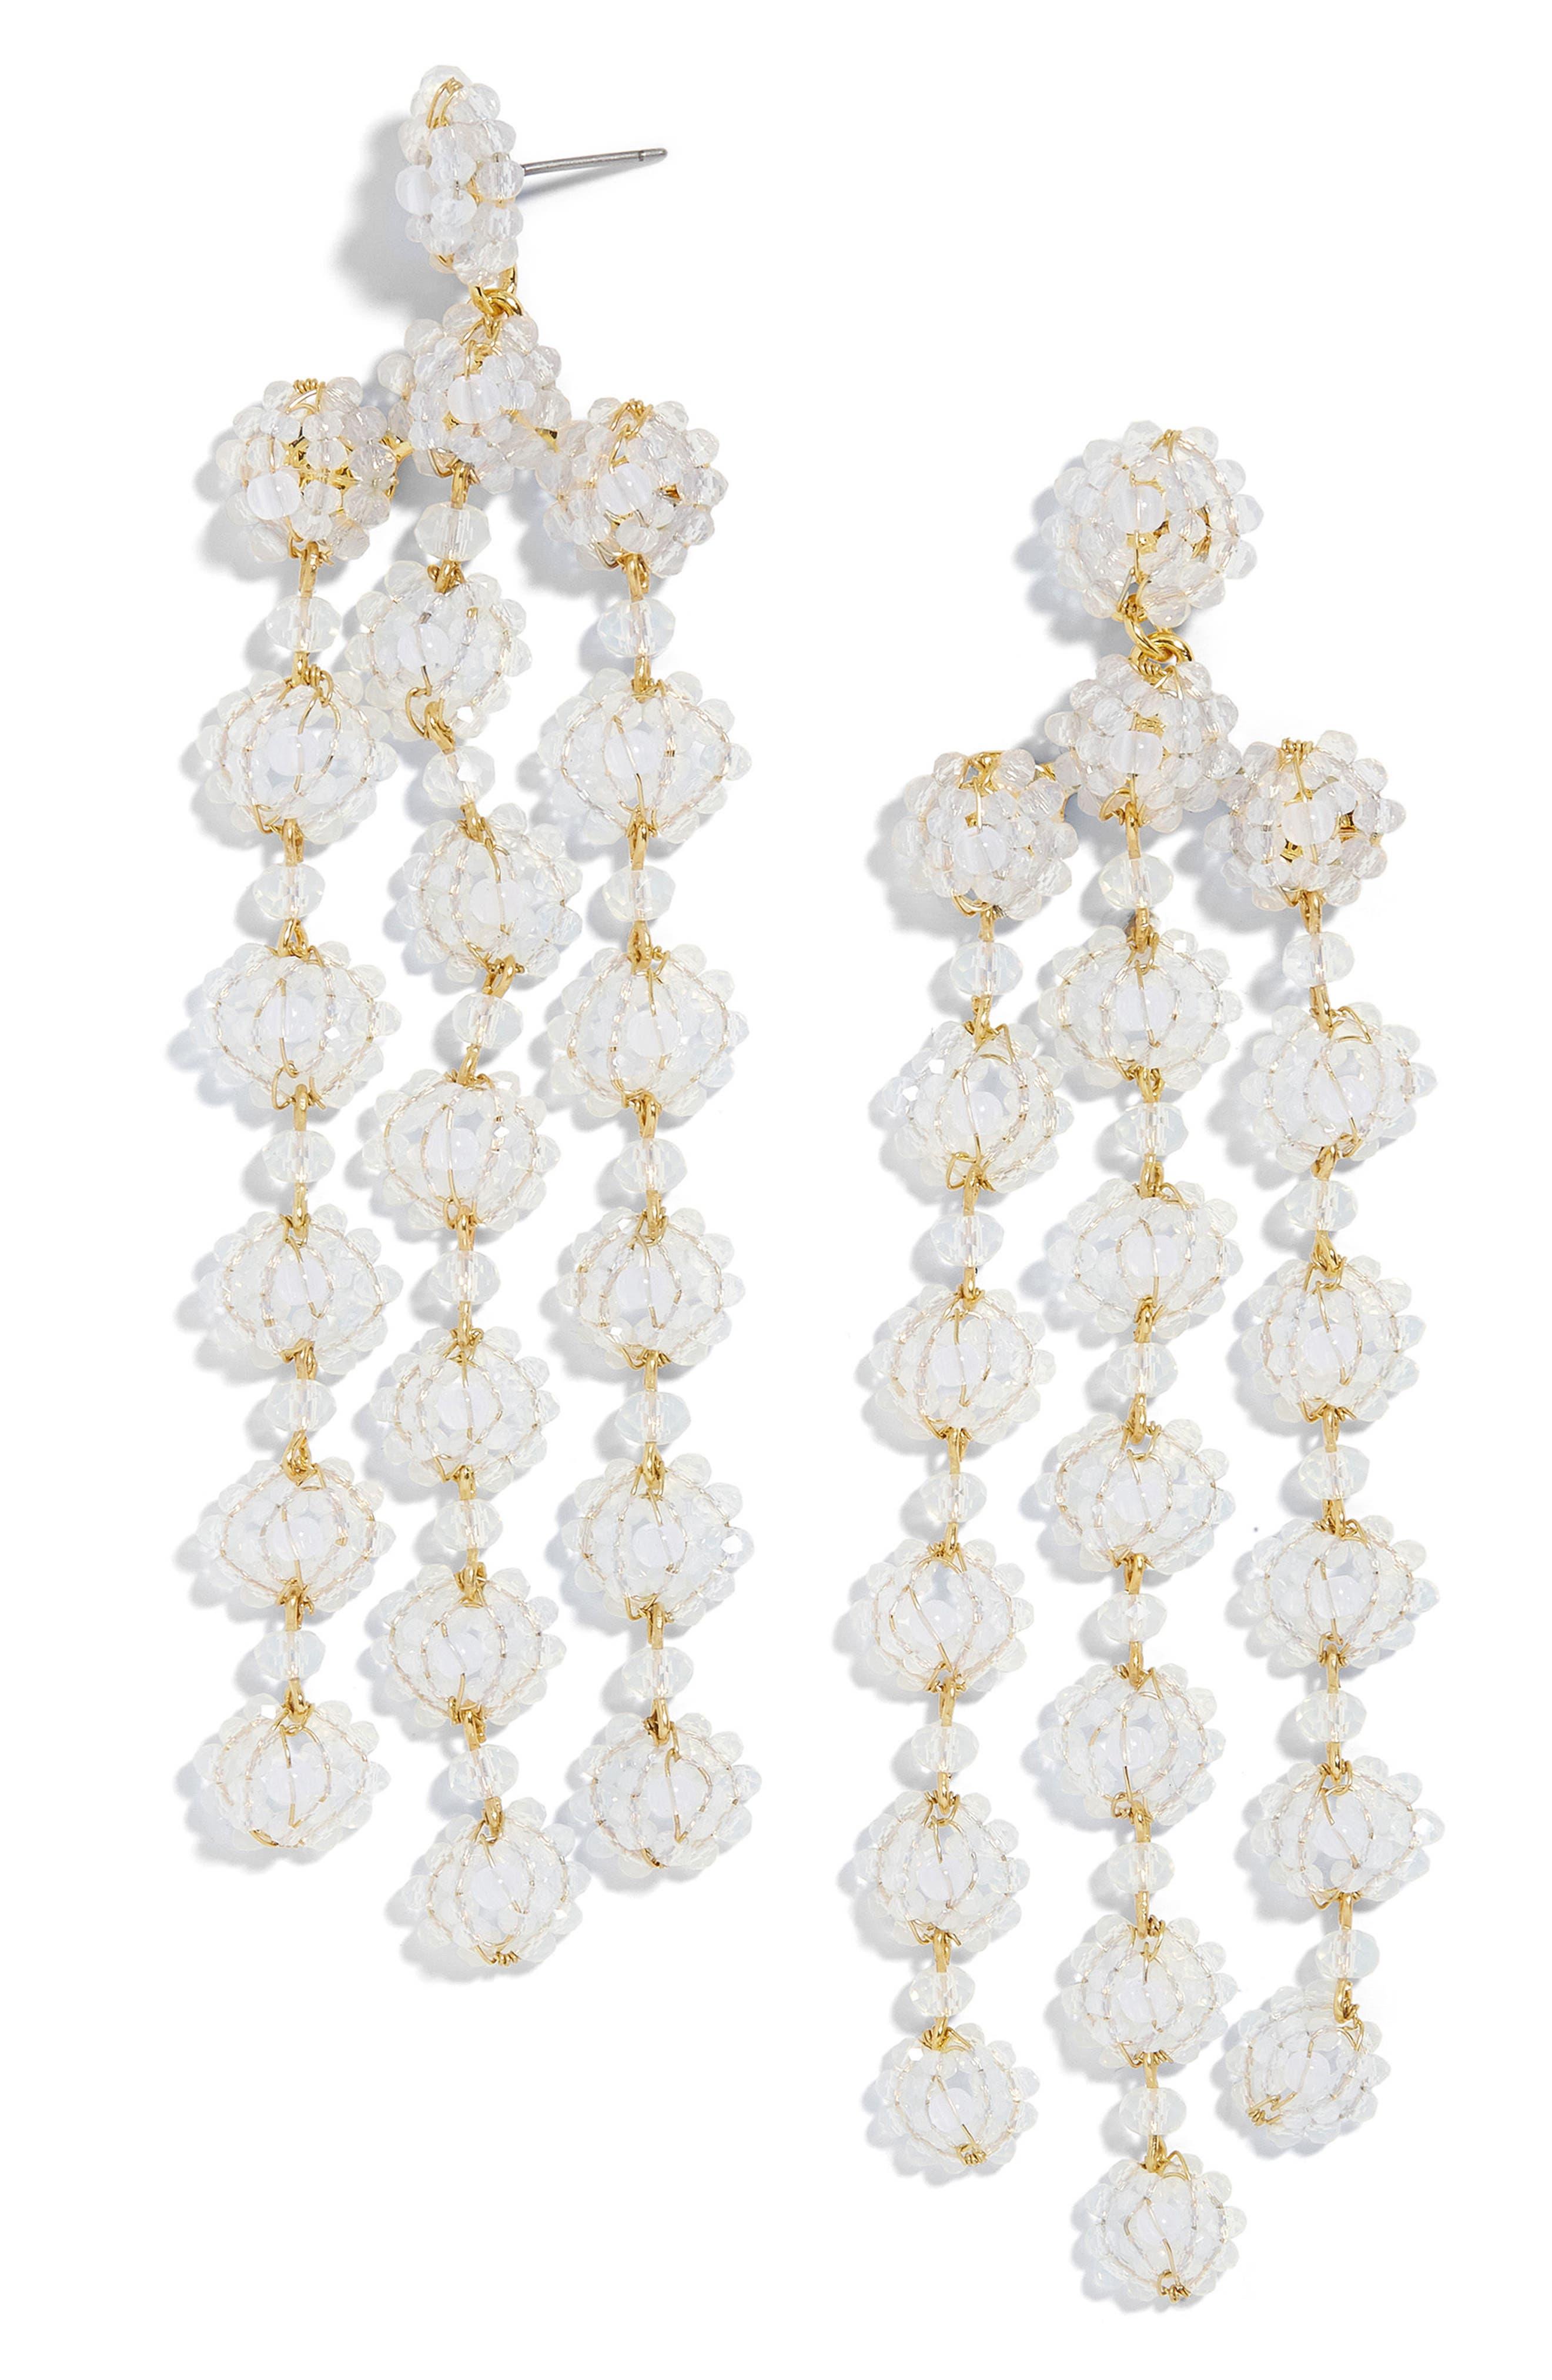 Shiori Beaded Chandelier Earrings,                             Main thumbnail 1, color,                             White